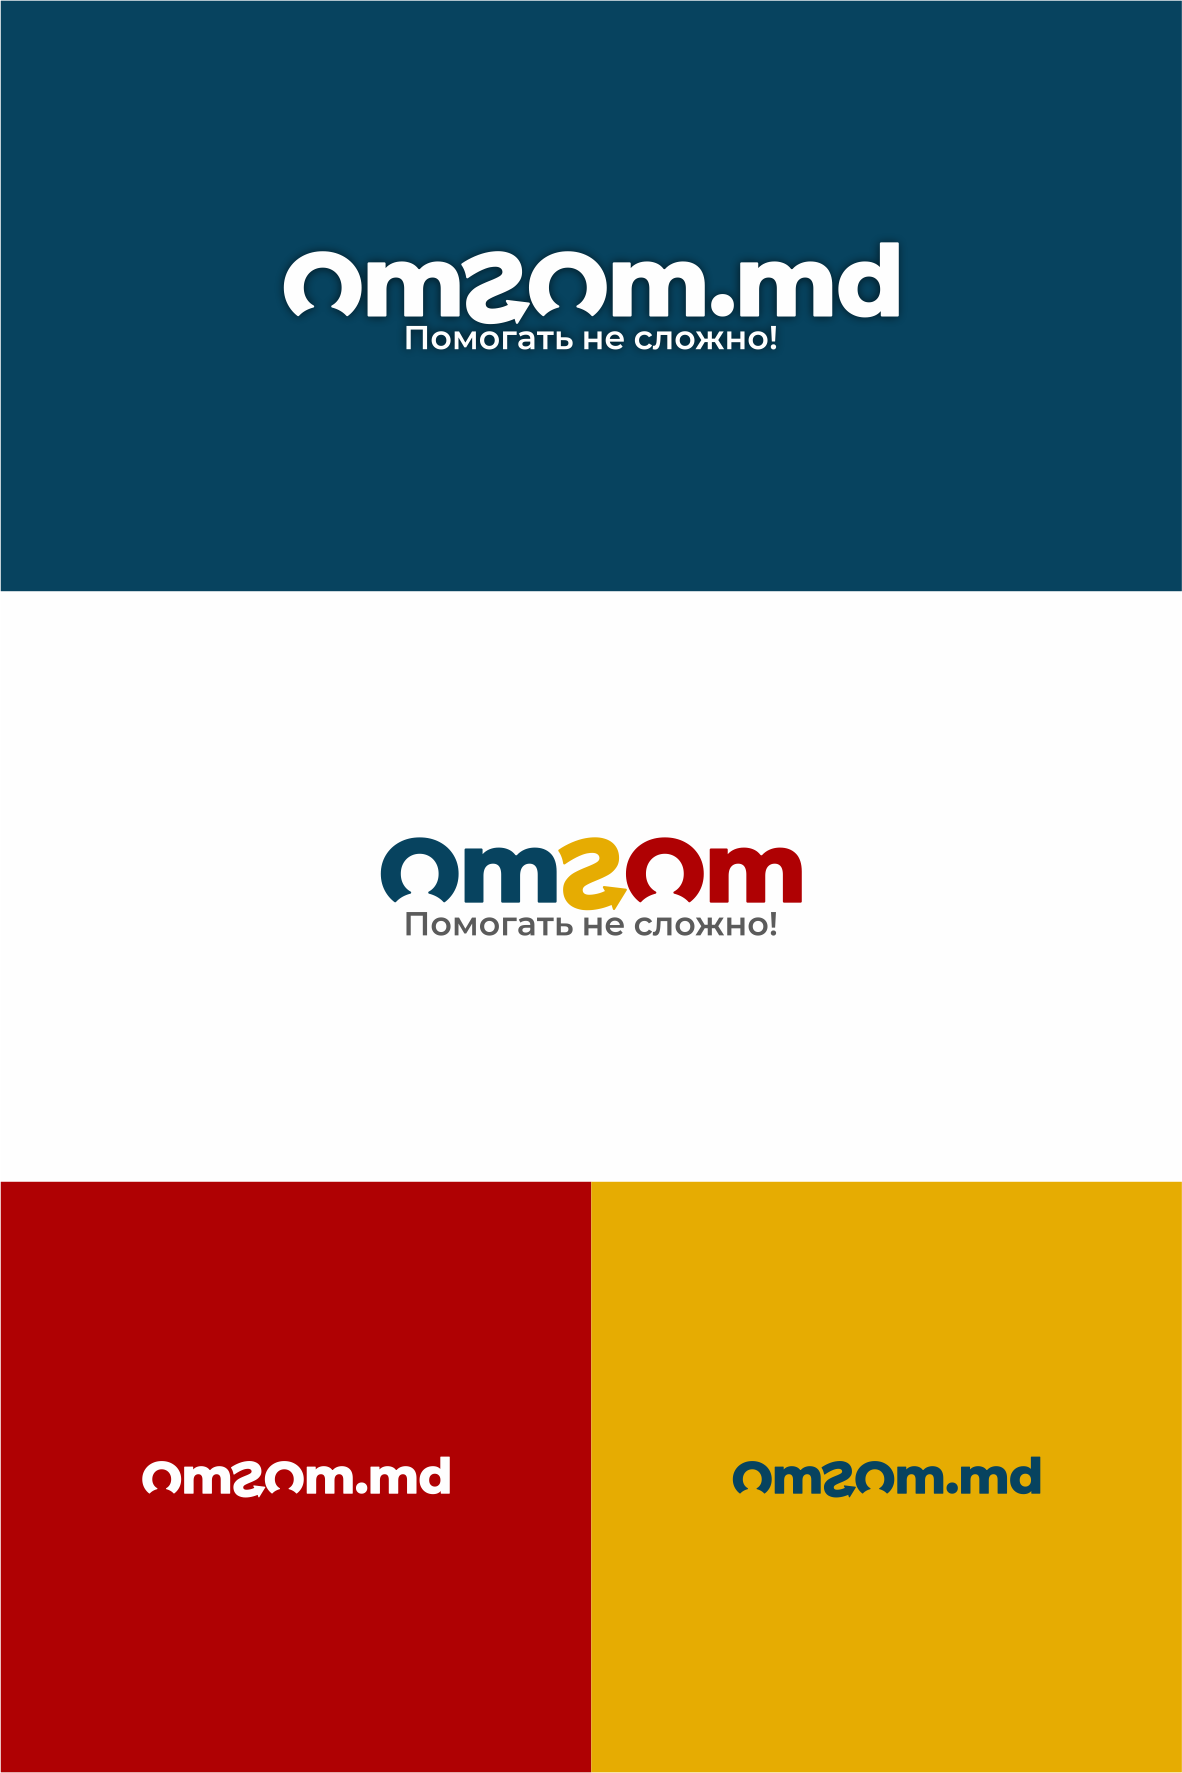 Разработка логотипа для краудфандинговой платформы om2om.md фото f_1105f5f3f9631dbe.png